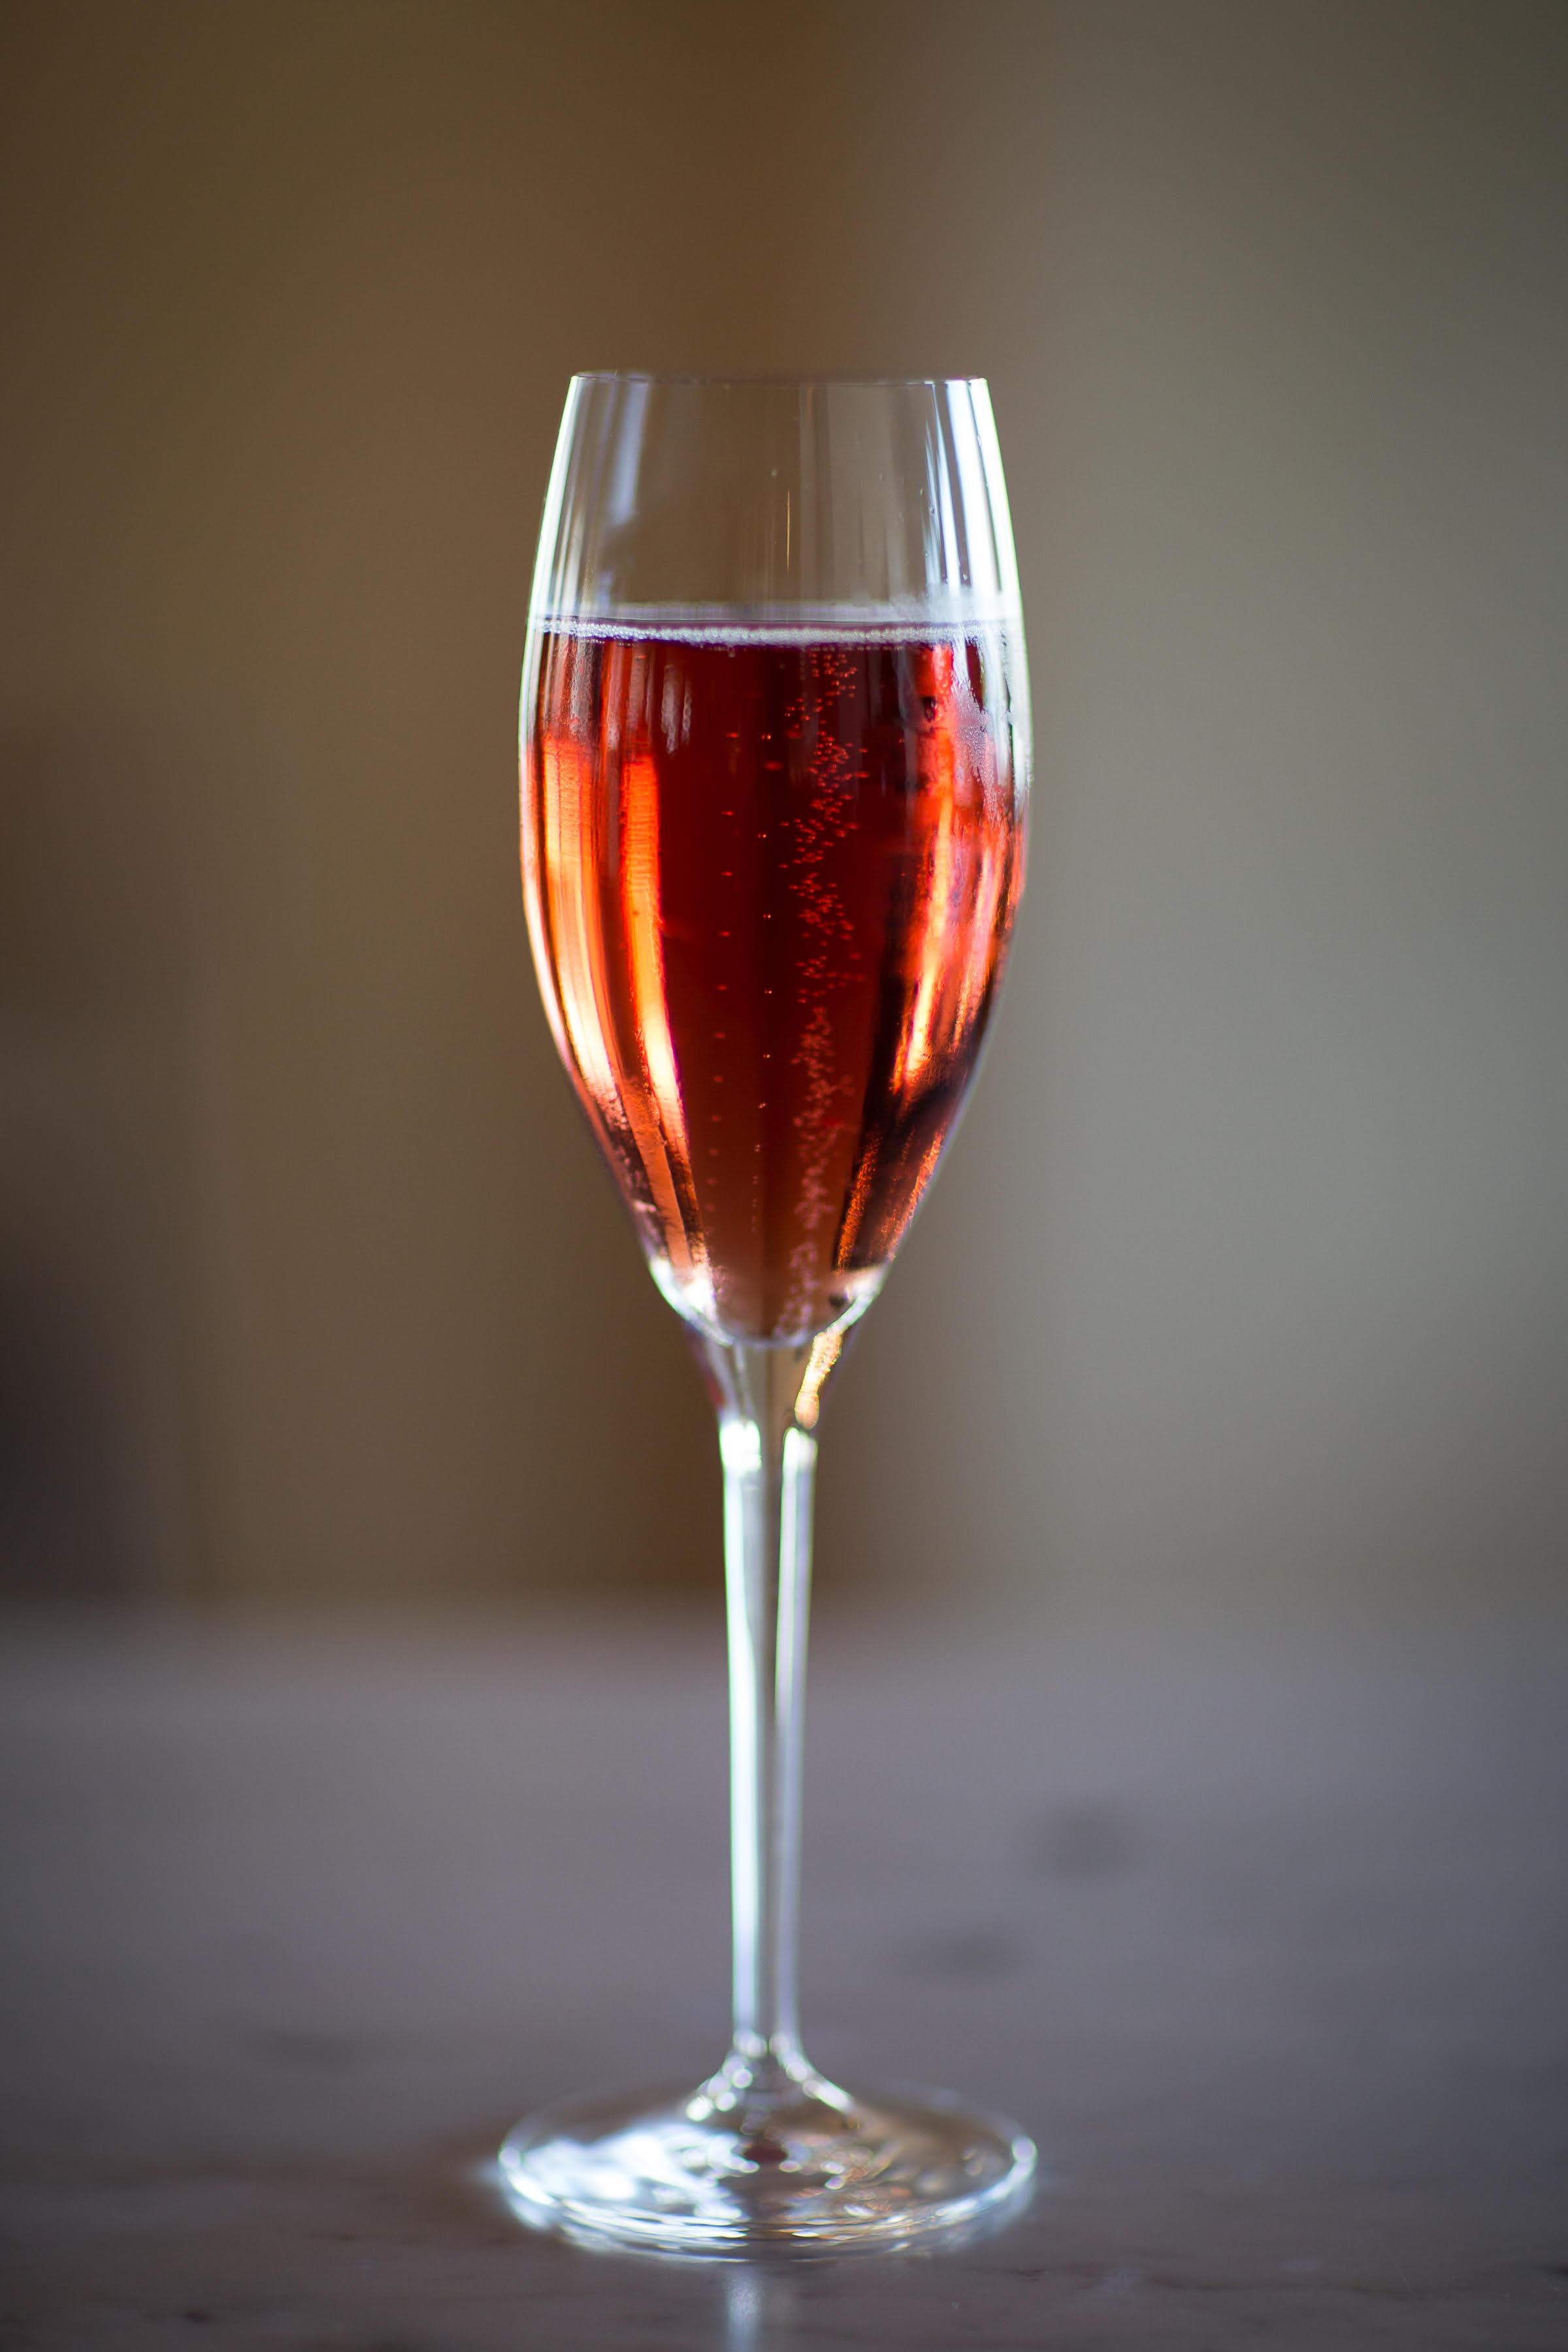 b27f99ba8e Portland Maine wine events schedule — Portland Wine Week